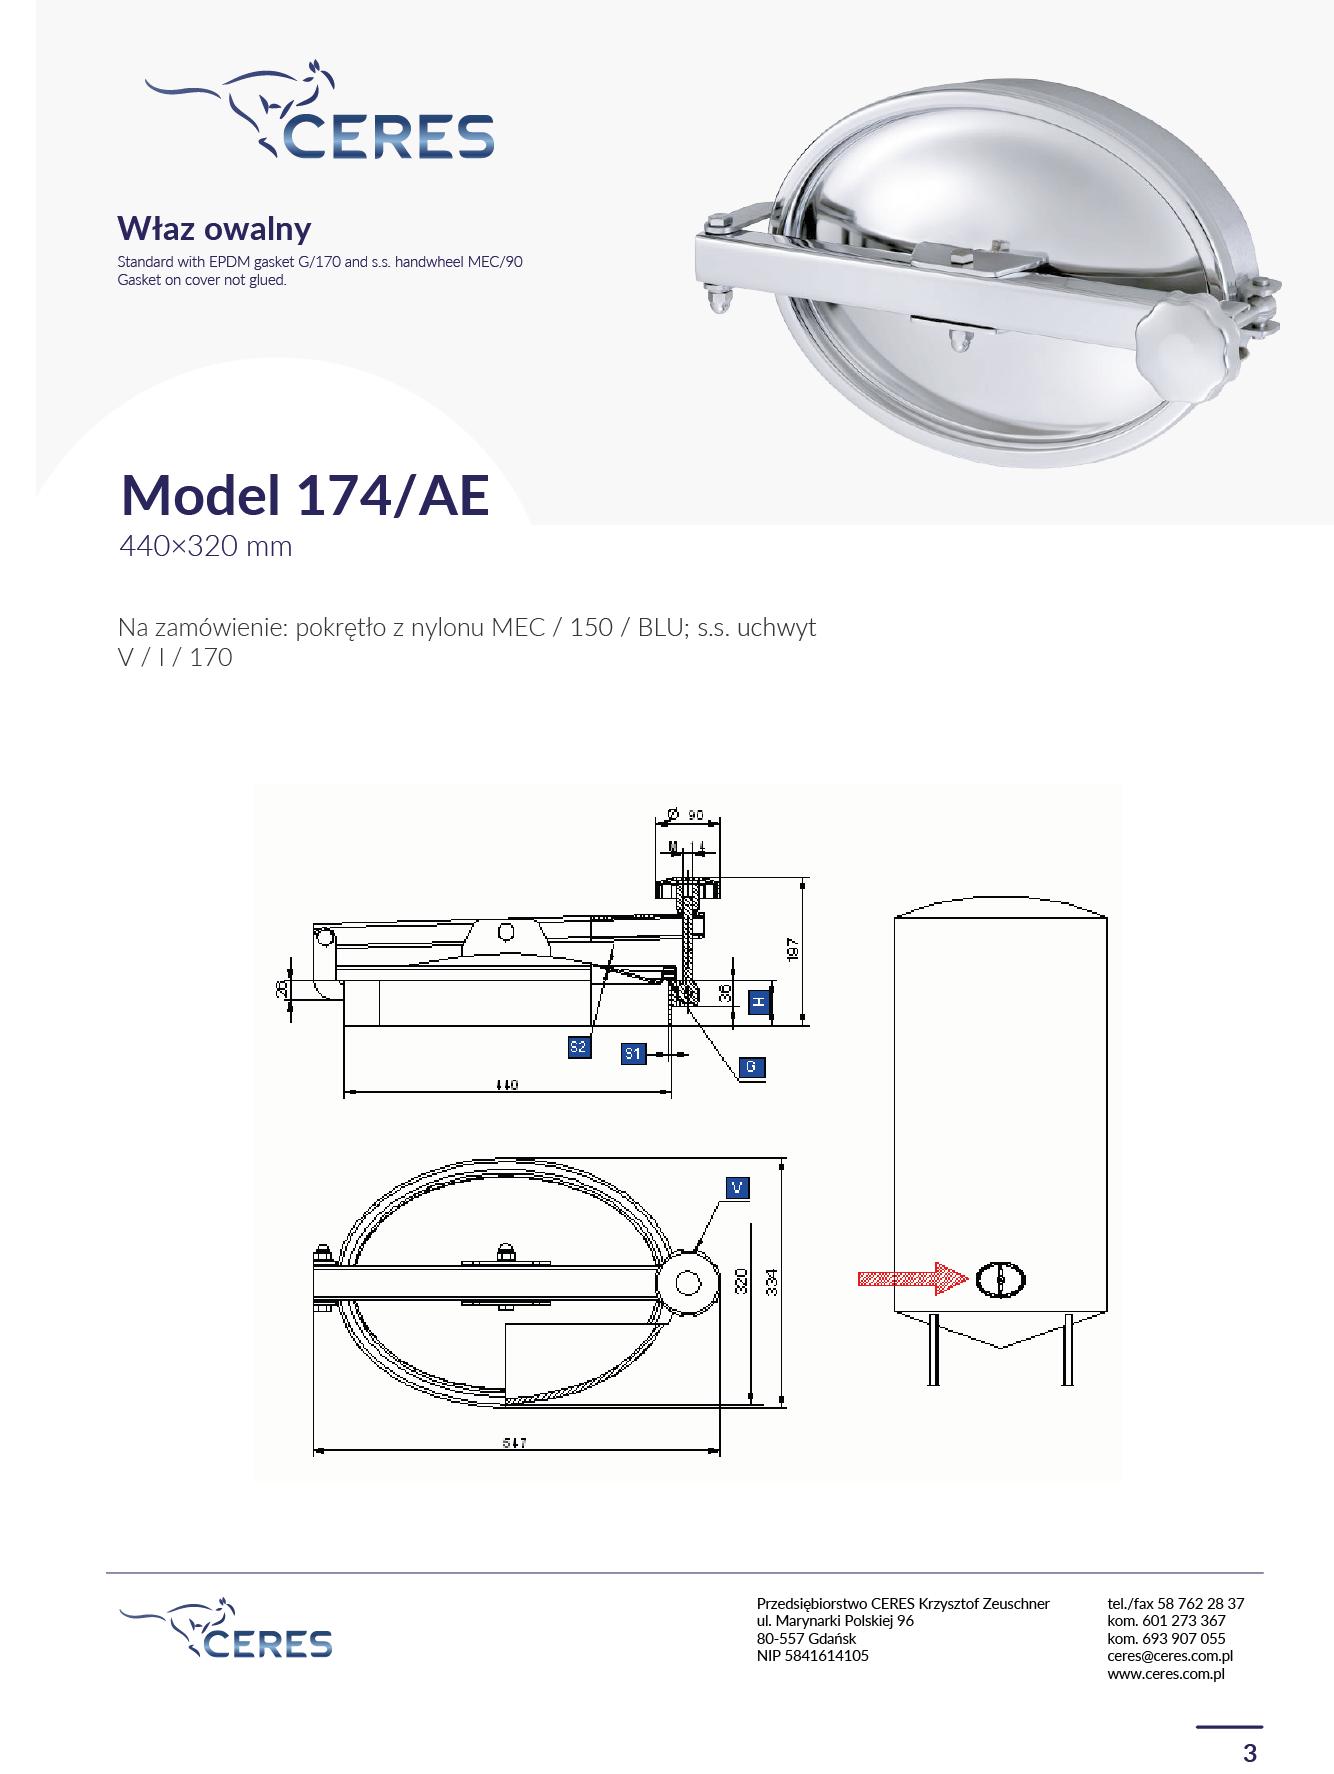 Model 174 AE